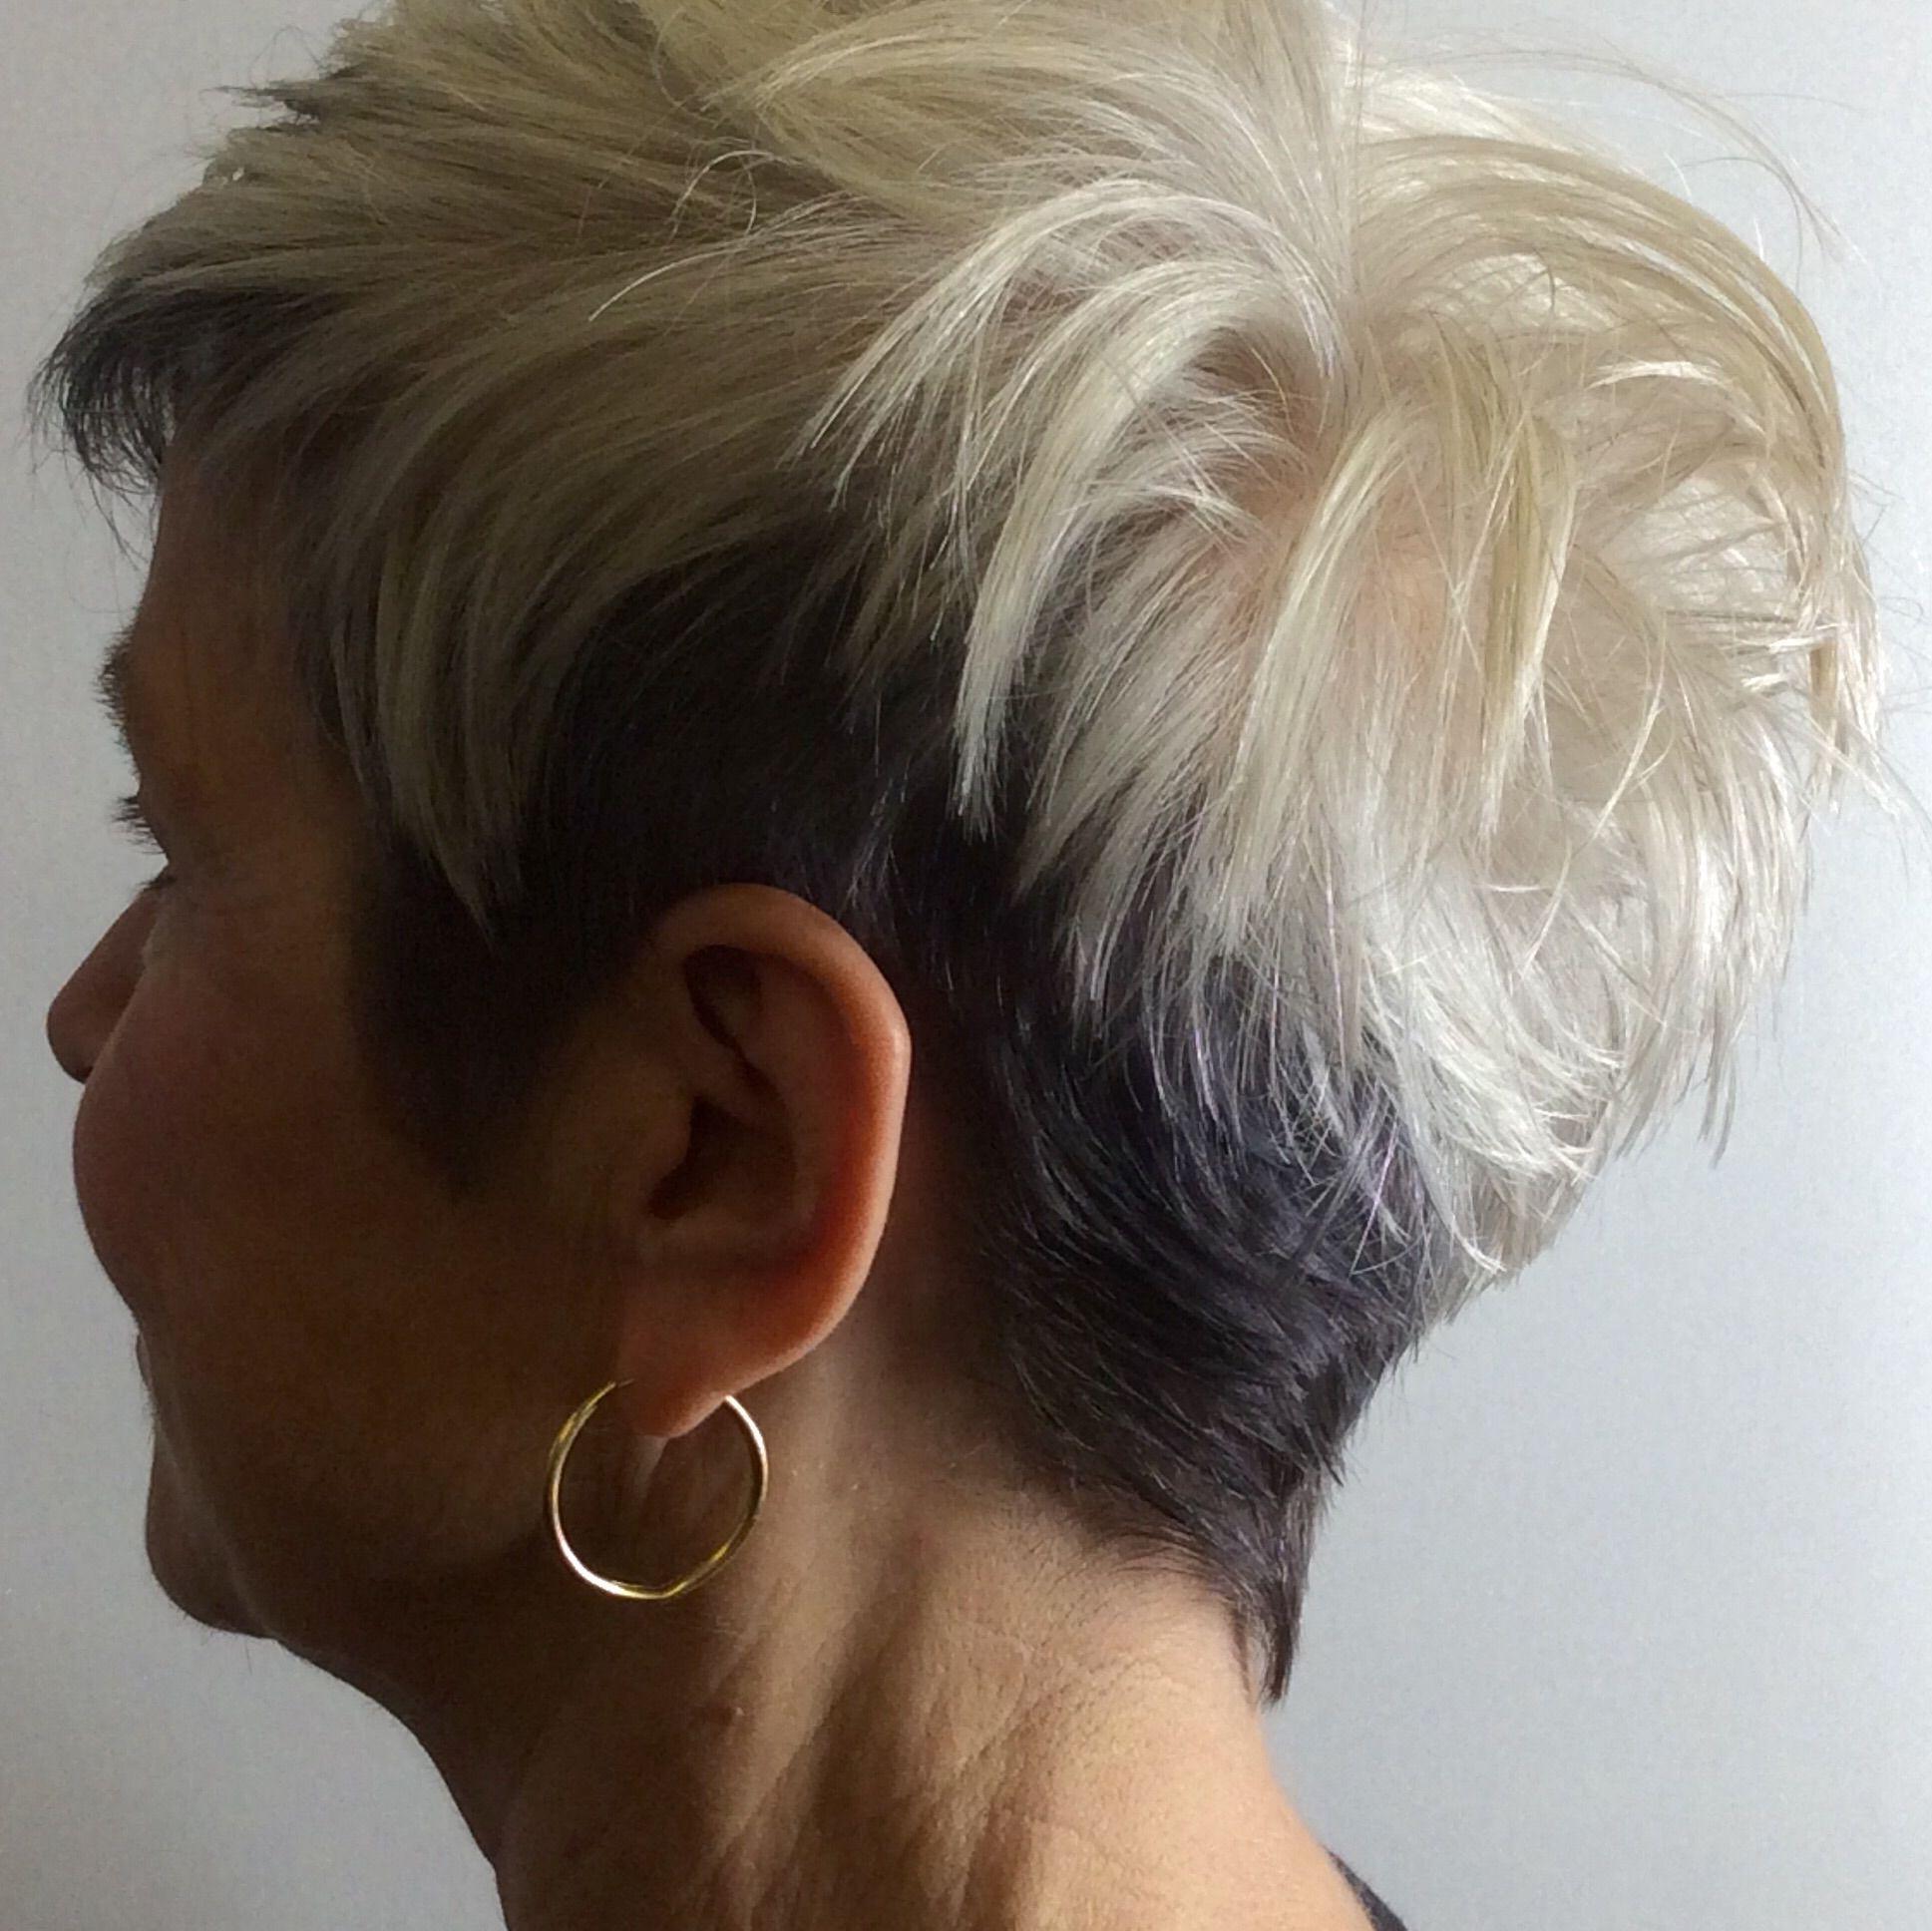 hårsalong styling labri